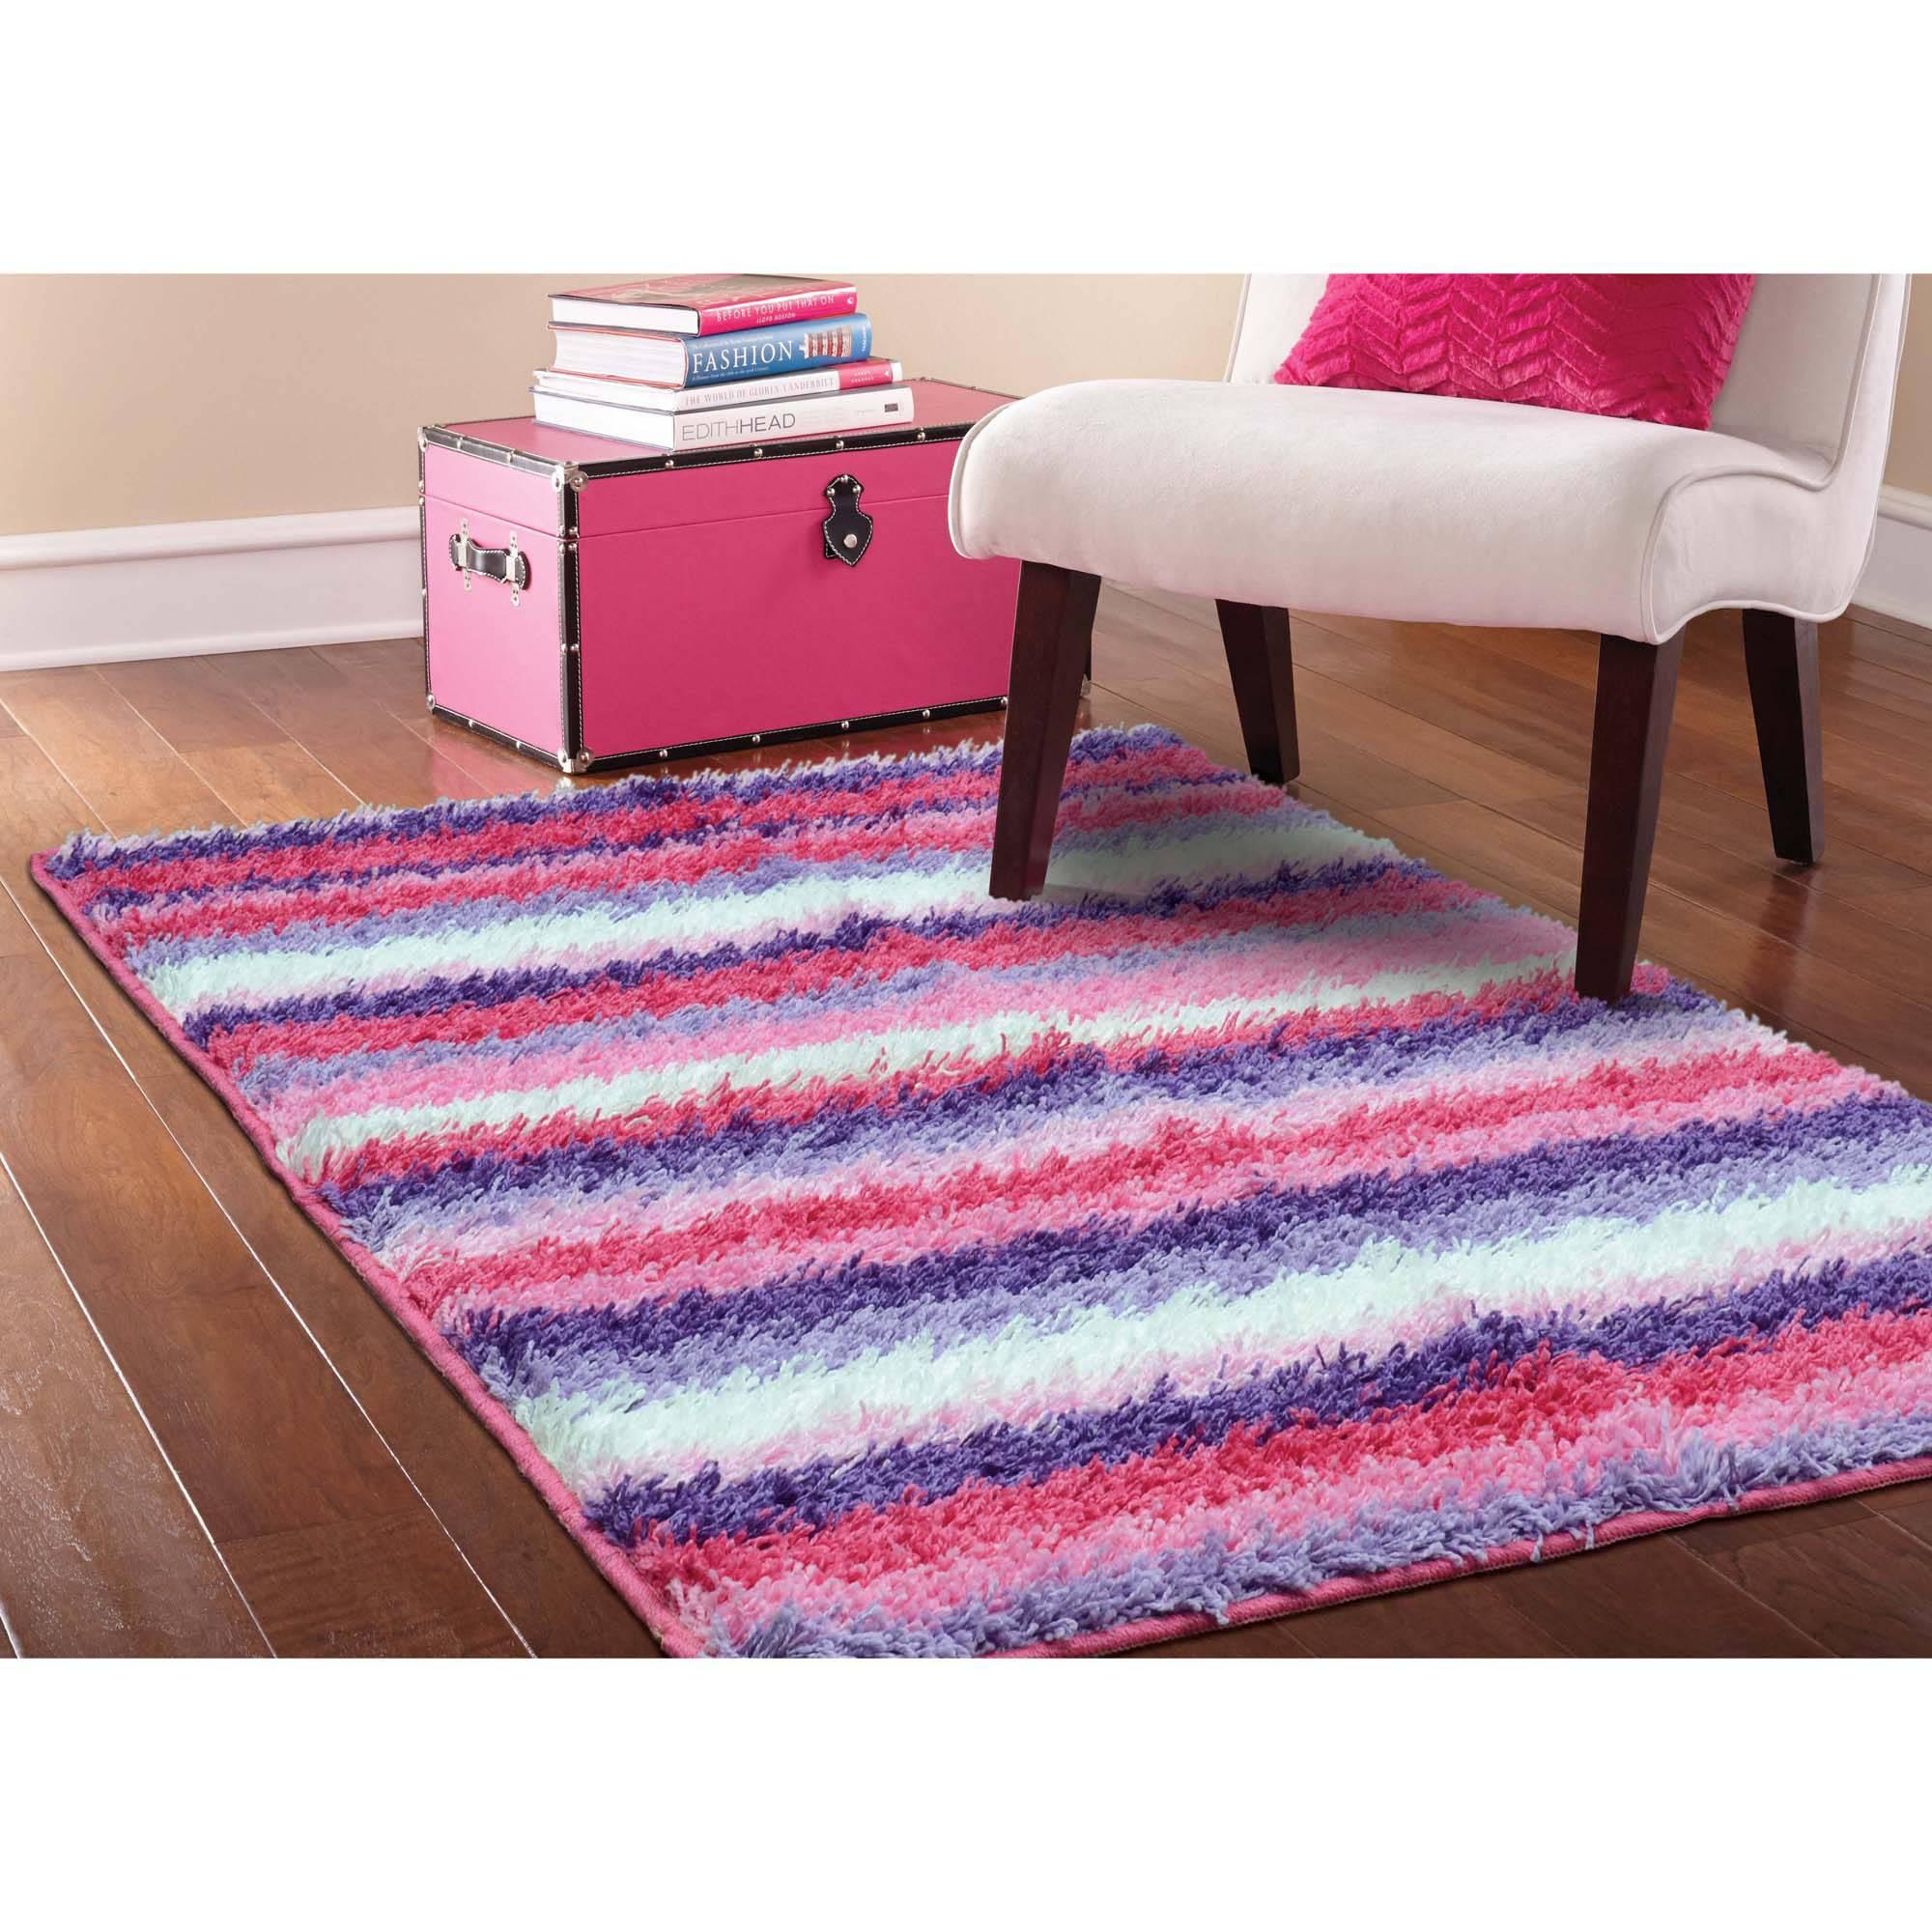 Your Zone Striped Shag Rug Pink 3 8 Quot X 2 6 Quot Walmart Com